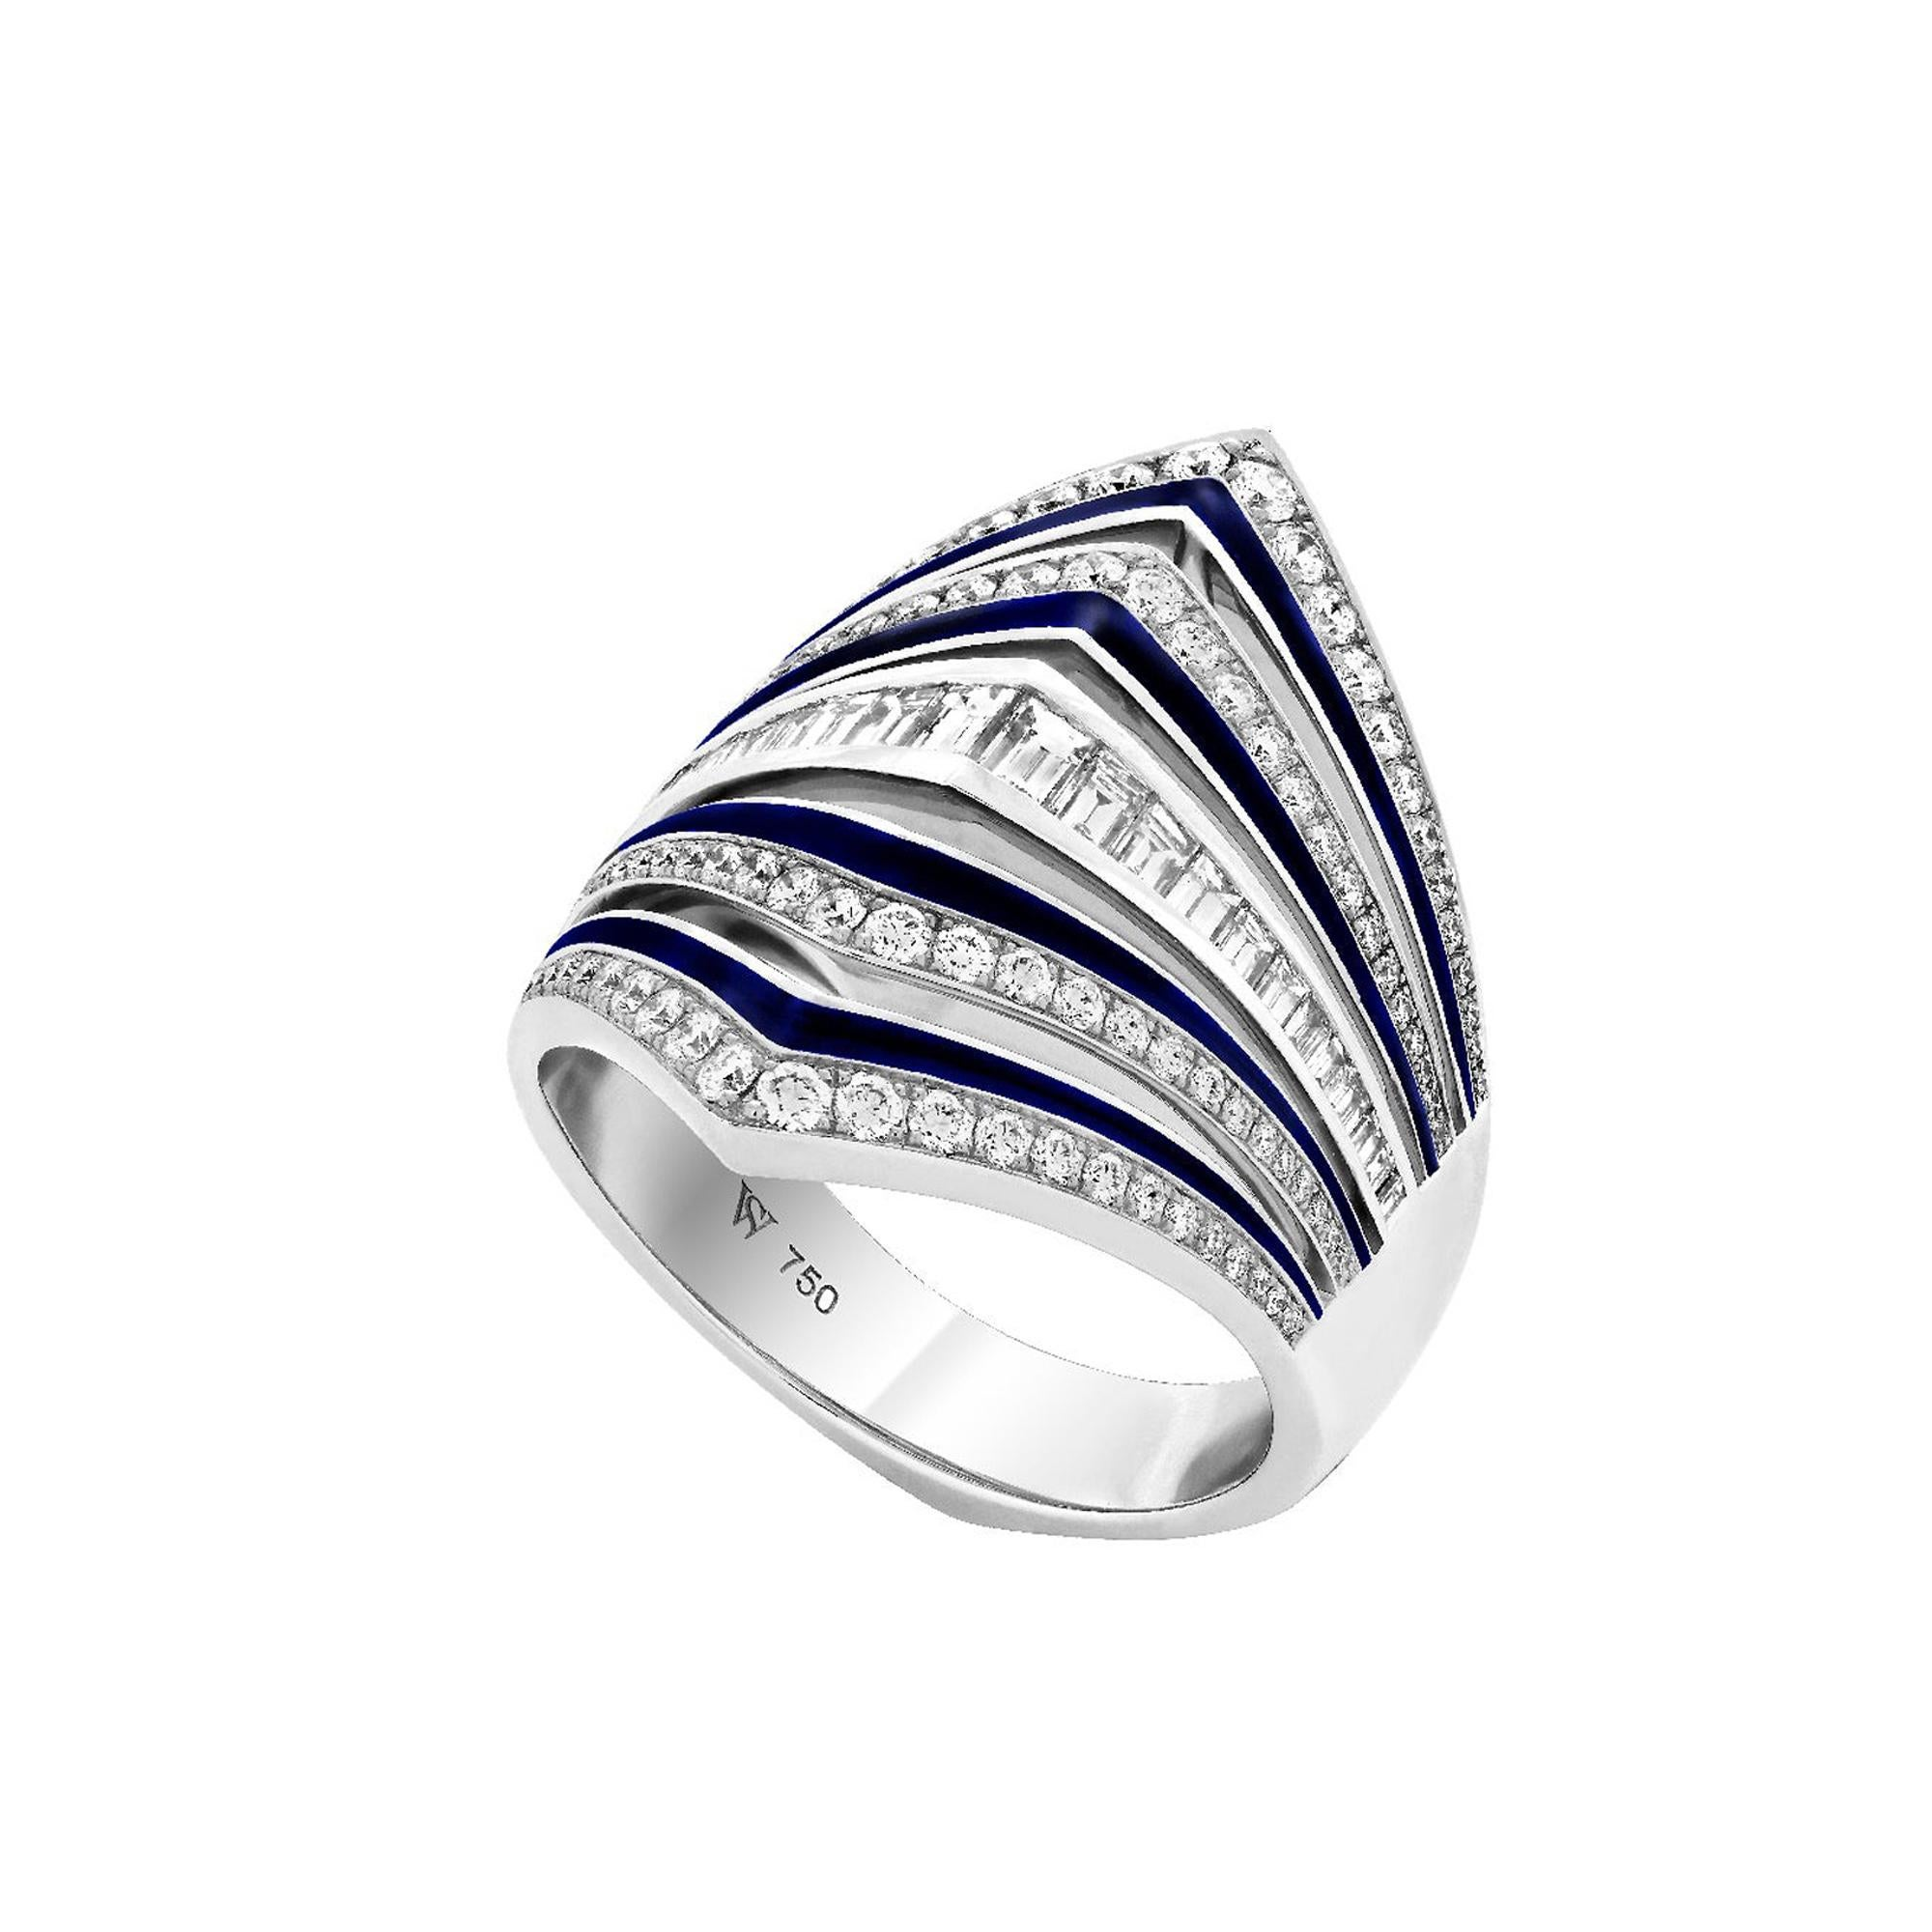 Stephen Webster Vertigo Gaining Perspective 18 Carat White Gold and Diamond Ring